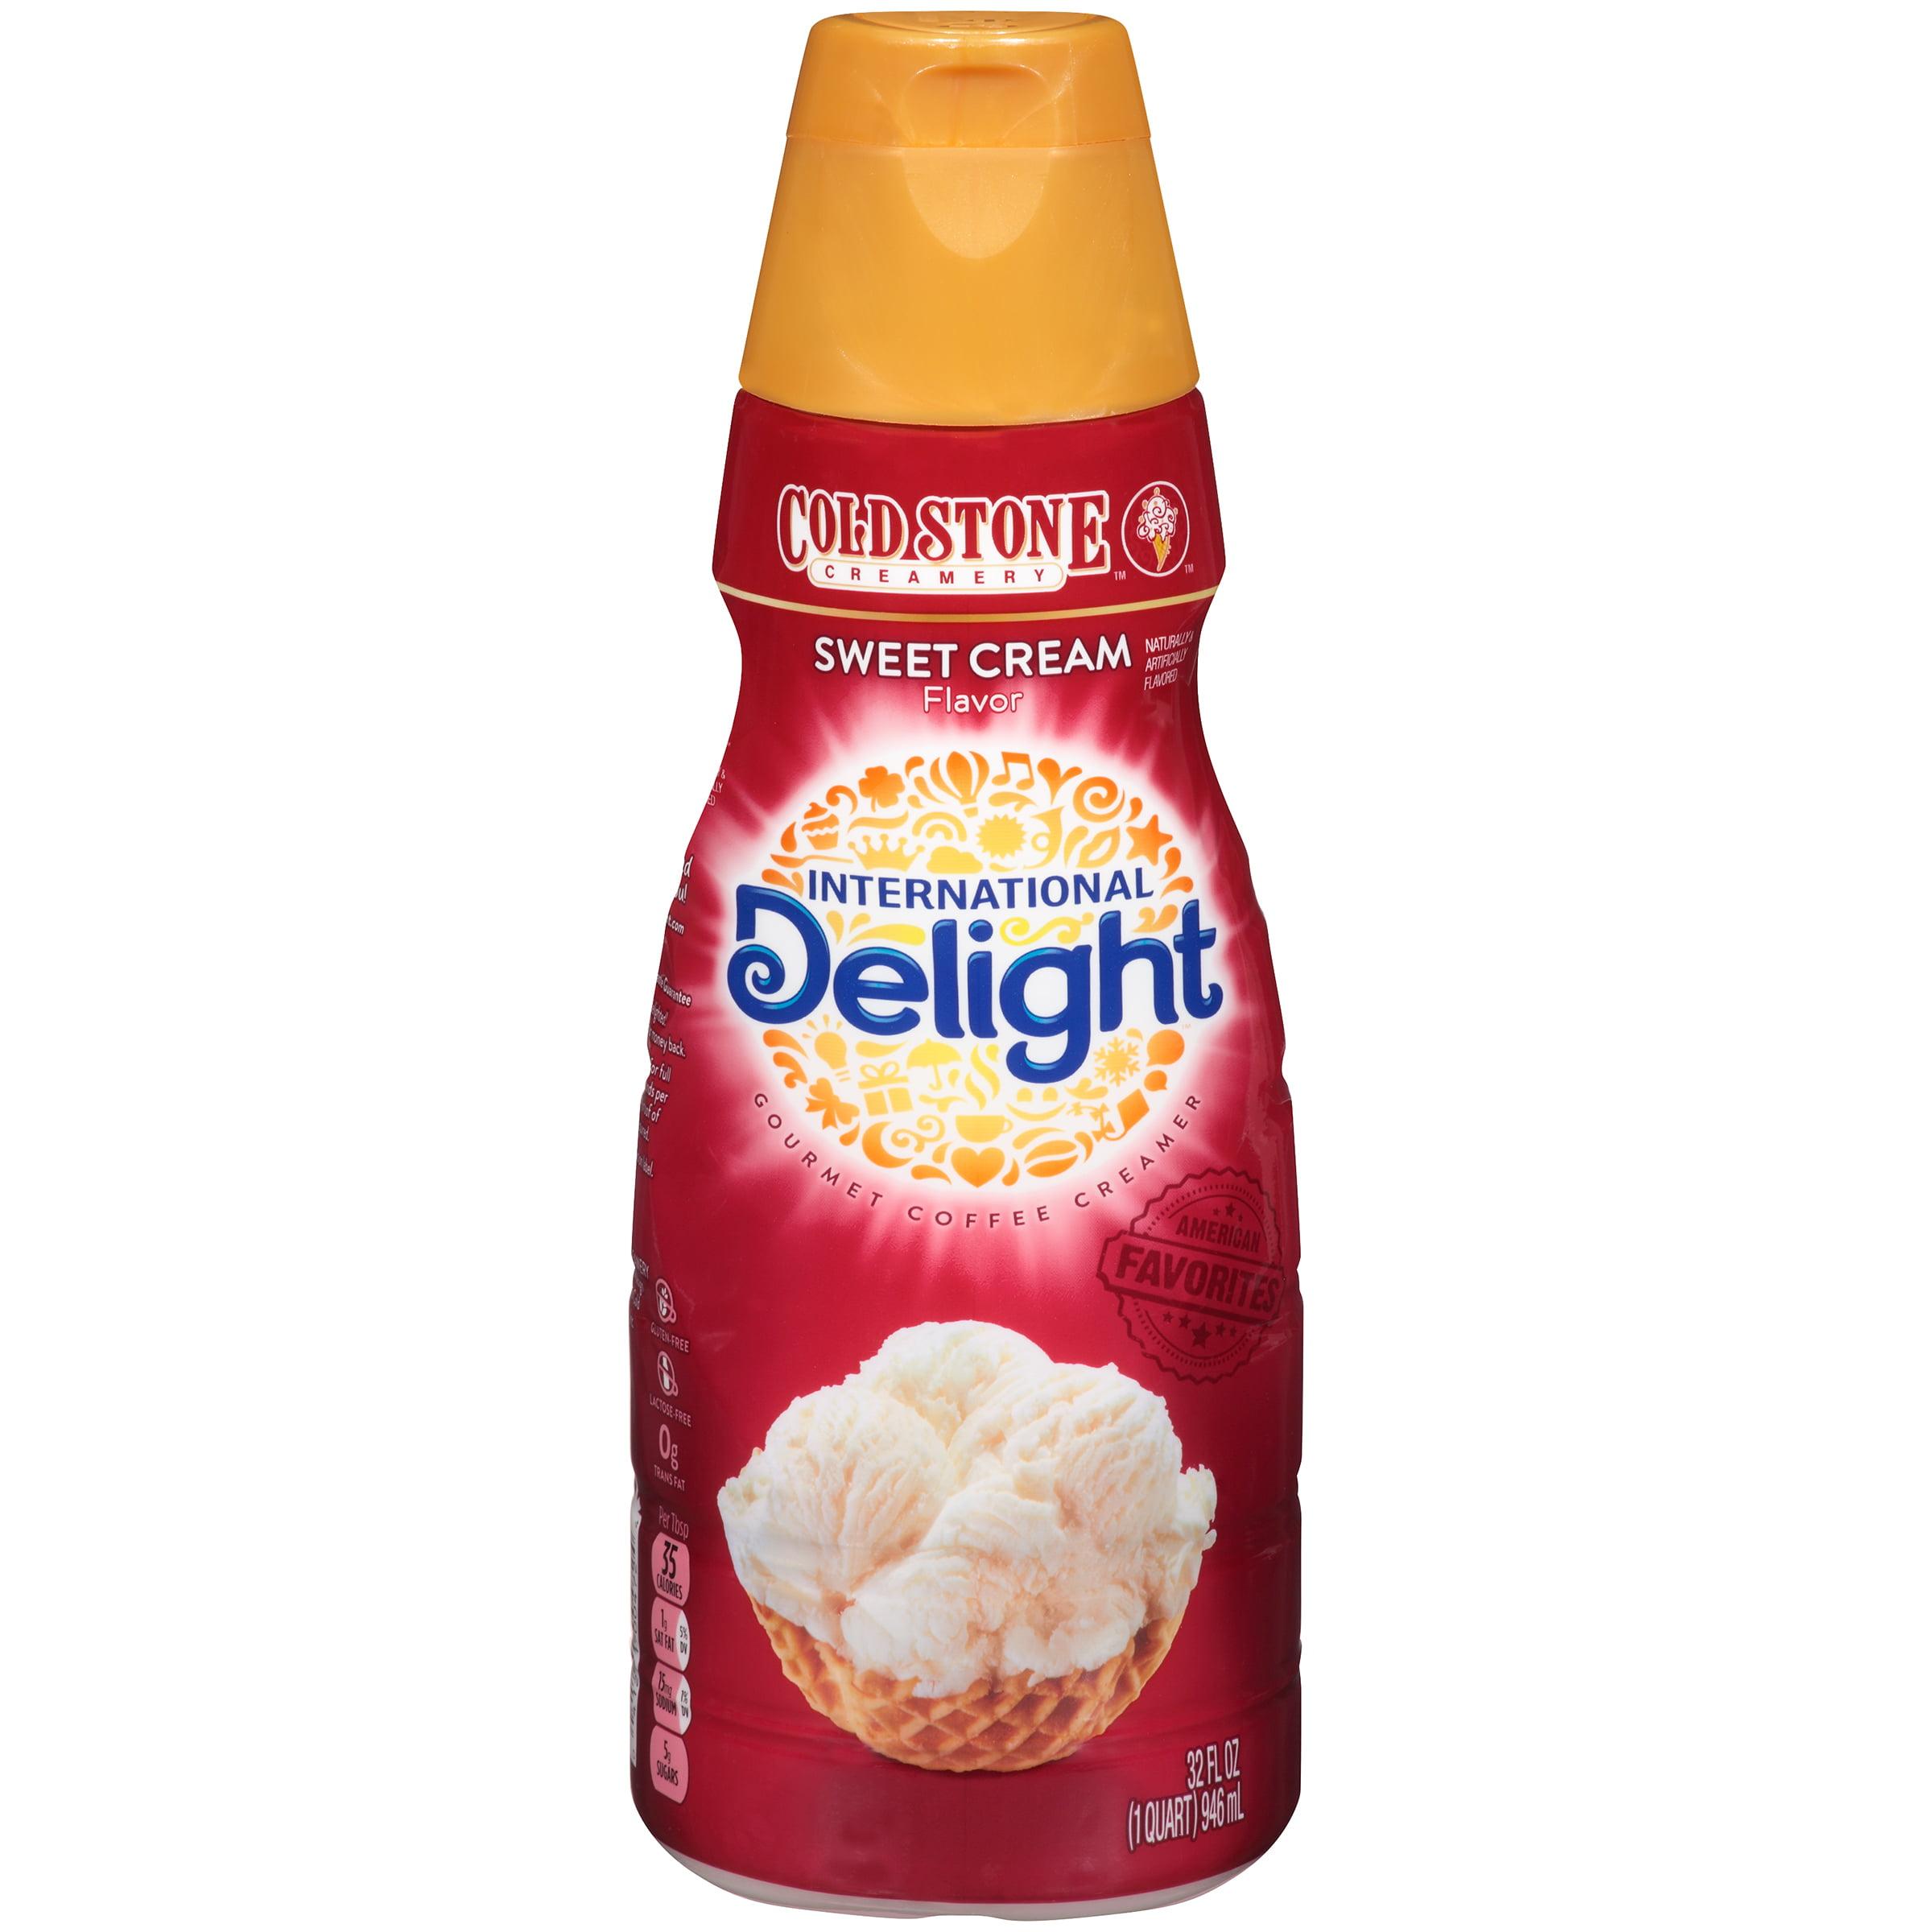 International Delight Cold Stone��� Creamery Sweet Cream Flavor Gourmet Coffee Creamer 32 fl. oz. Bottle